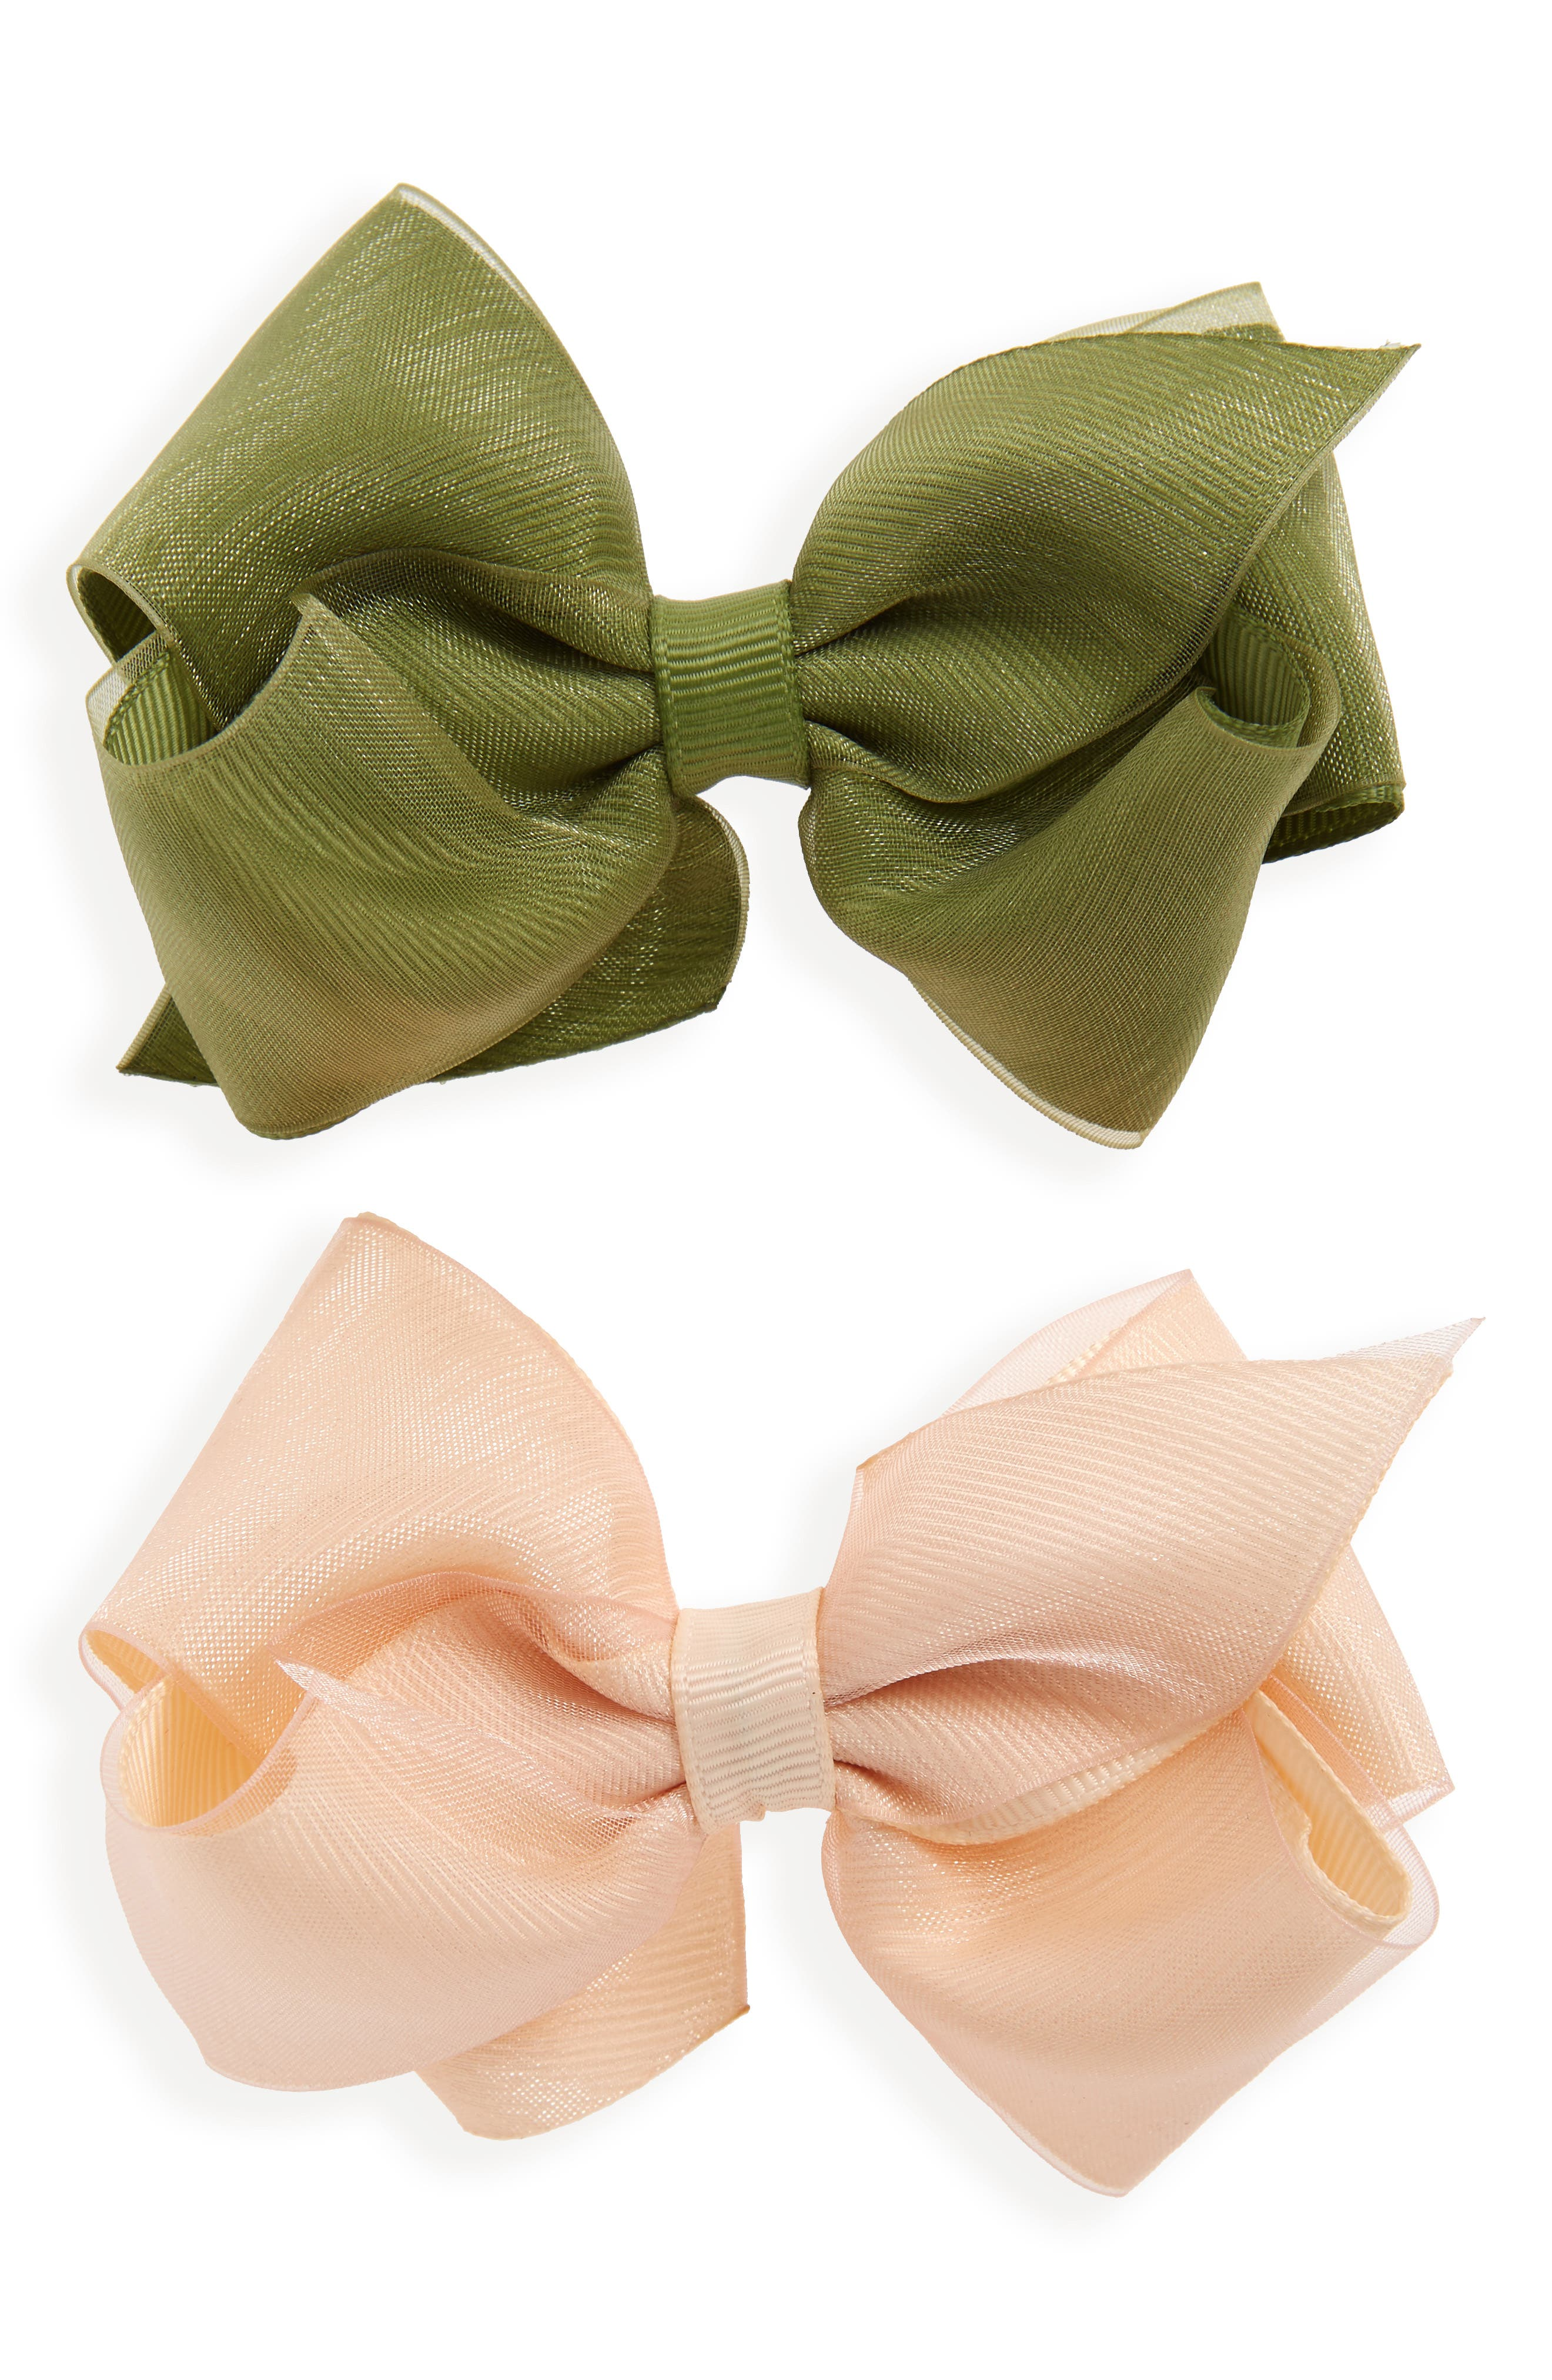 2-Pack Organza Bow Hair Clips,                             Main thumbnail 1, color,                             NUDE